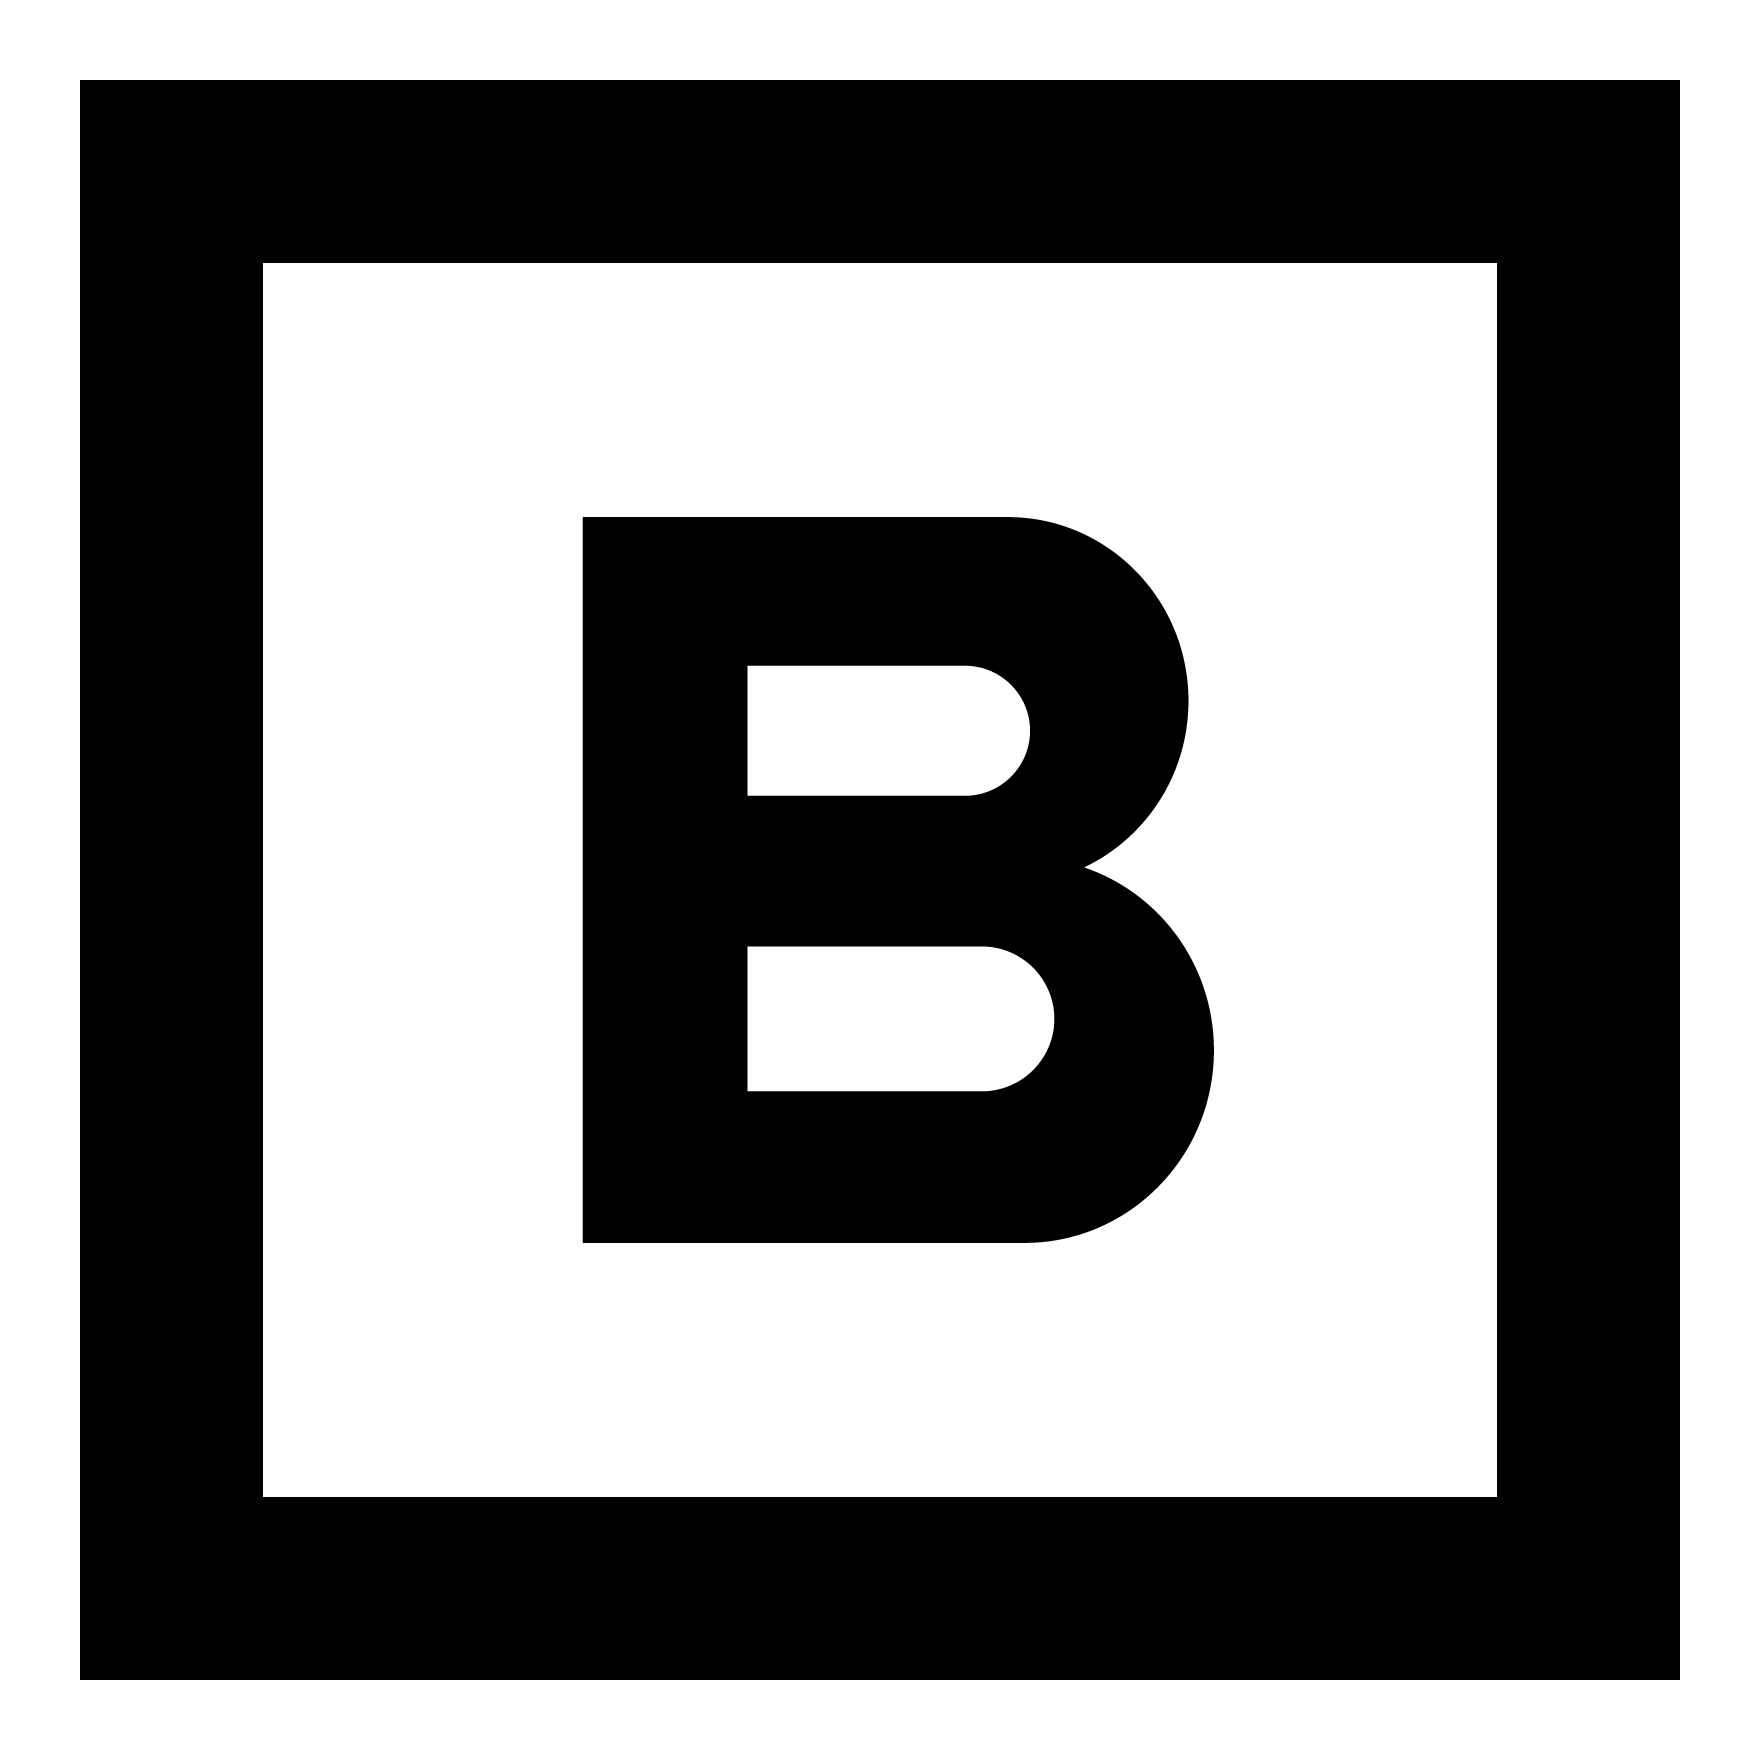 icon-black-outline